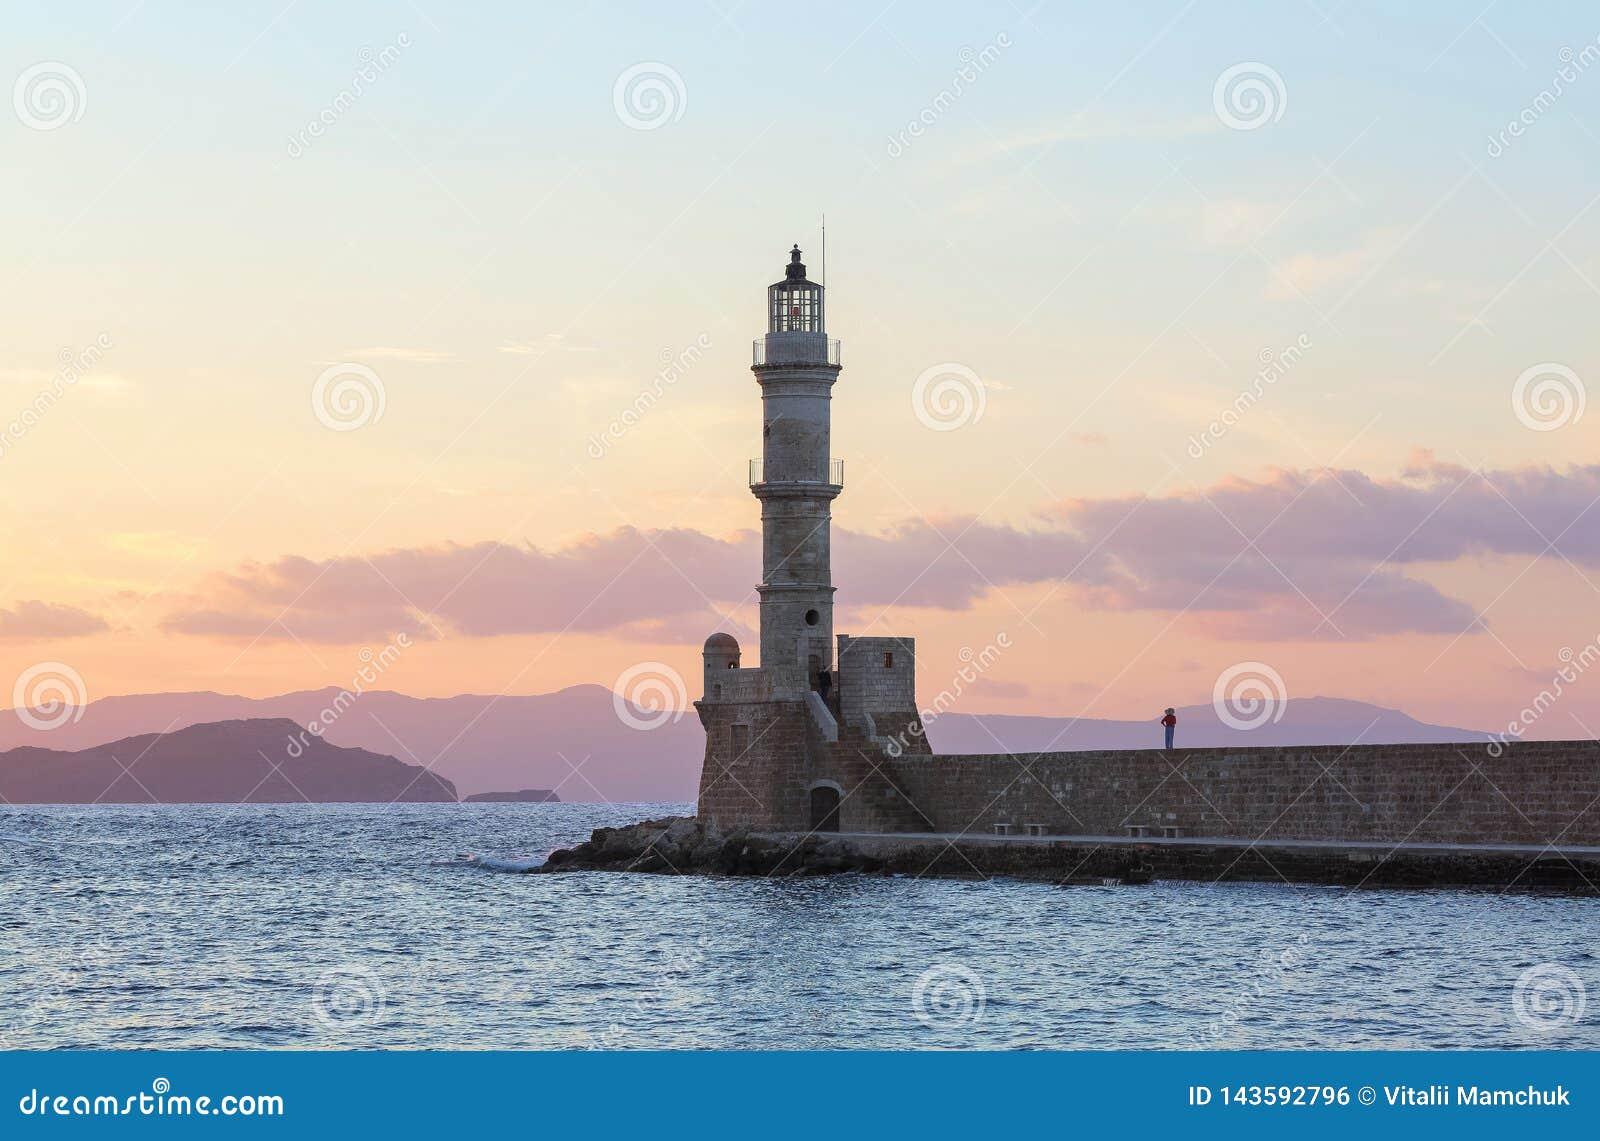 High, beautiful, ancient lighthouse made of bricks. Marvelous sunset lights the sky. Touristic resort Chania, Creete island.